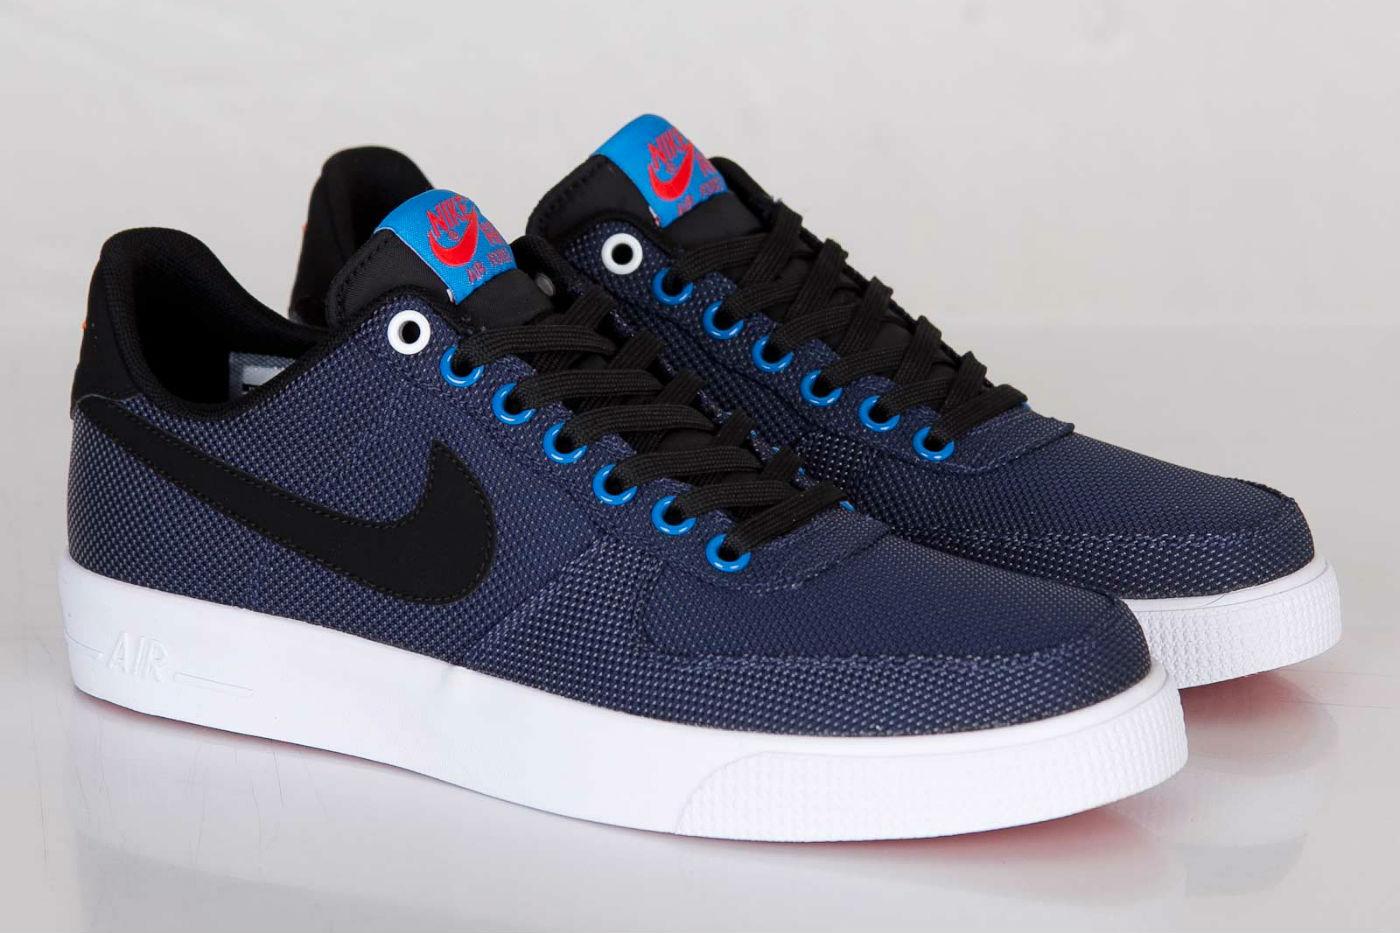 Nike Air Force 1 AC Premium QS Midnight Navy